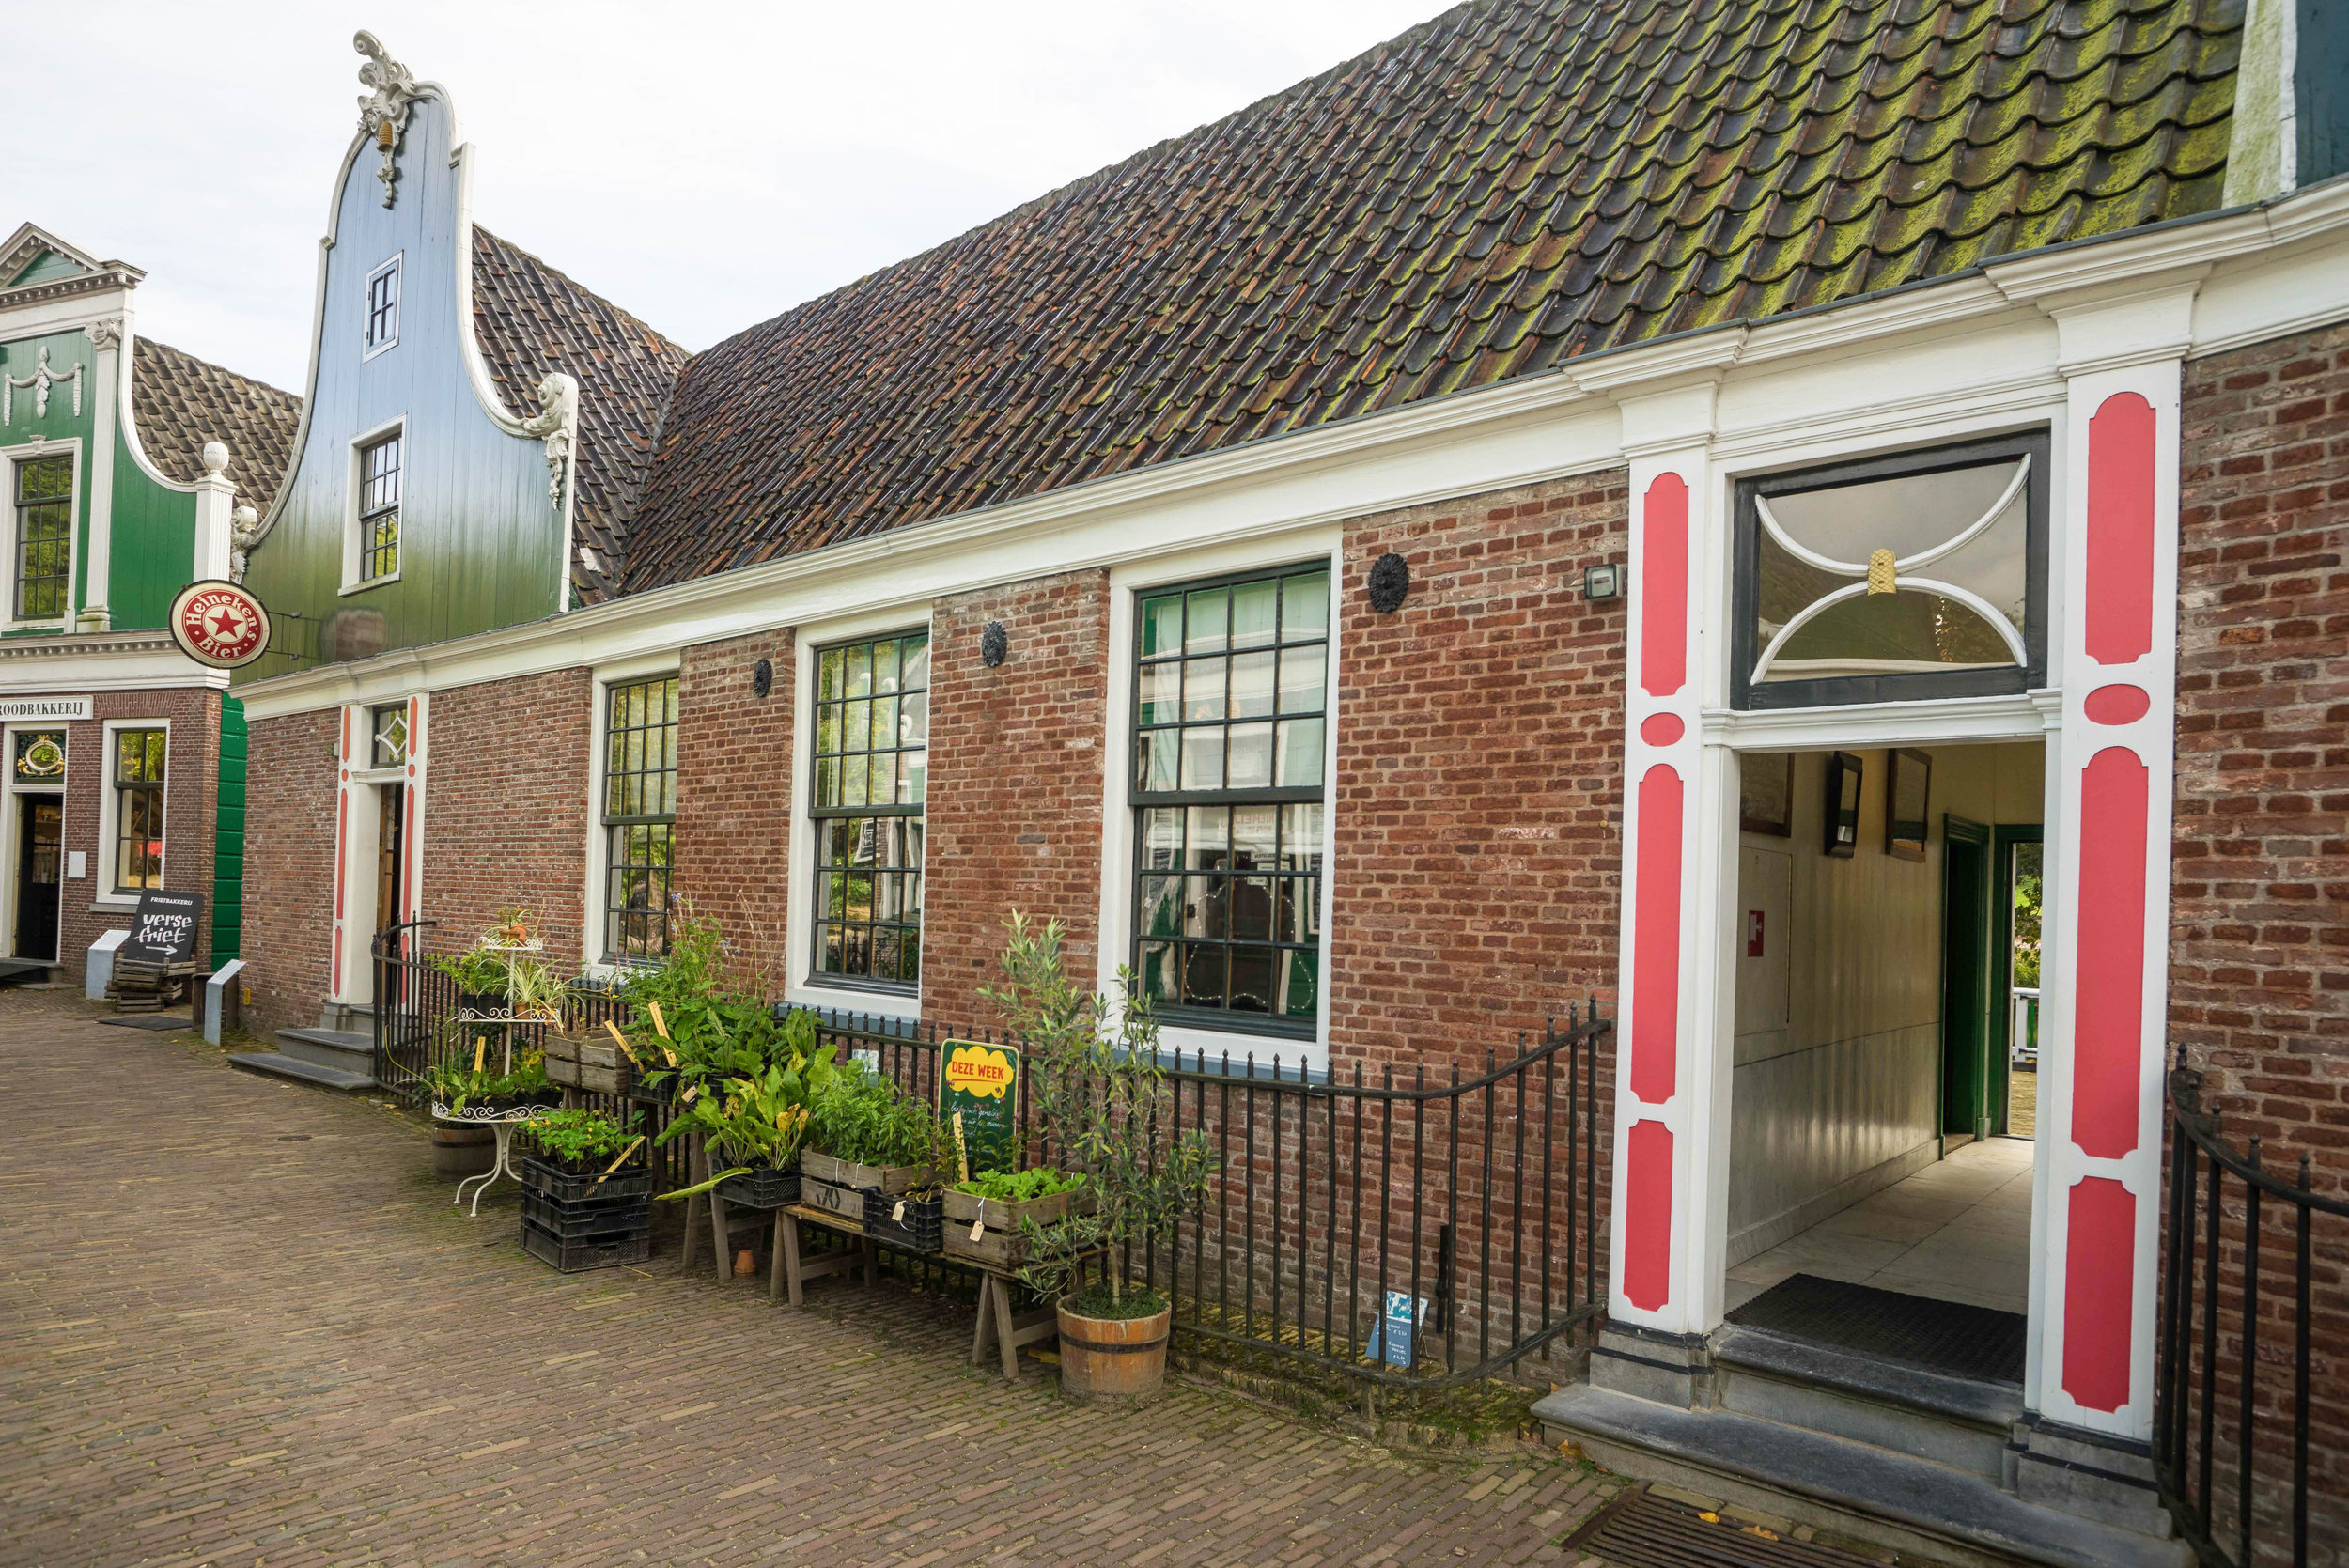 Nederland 10-01-2017 Dev LR-129.jpg